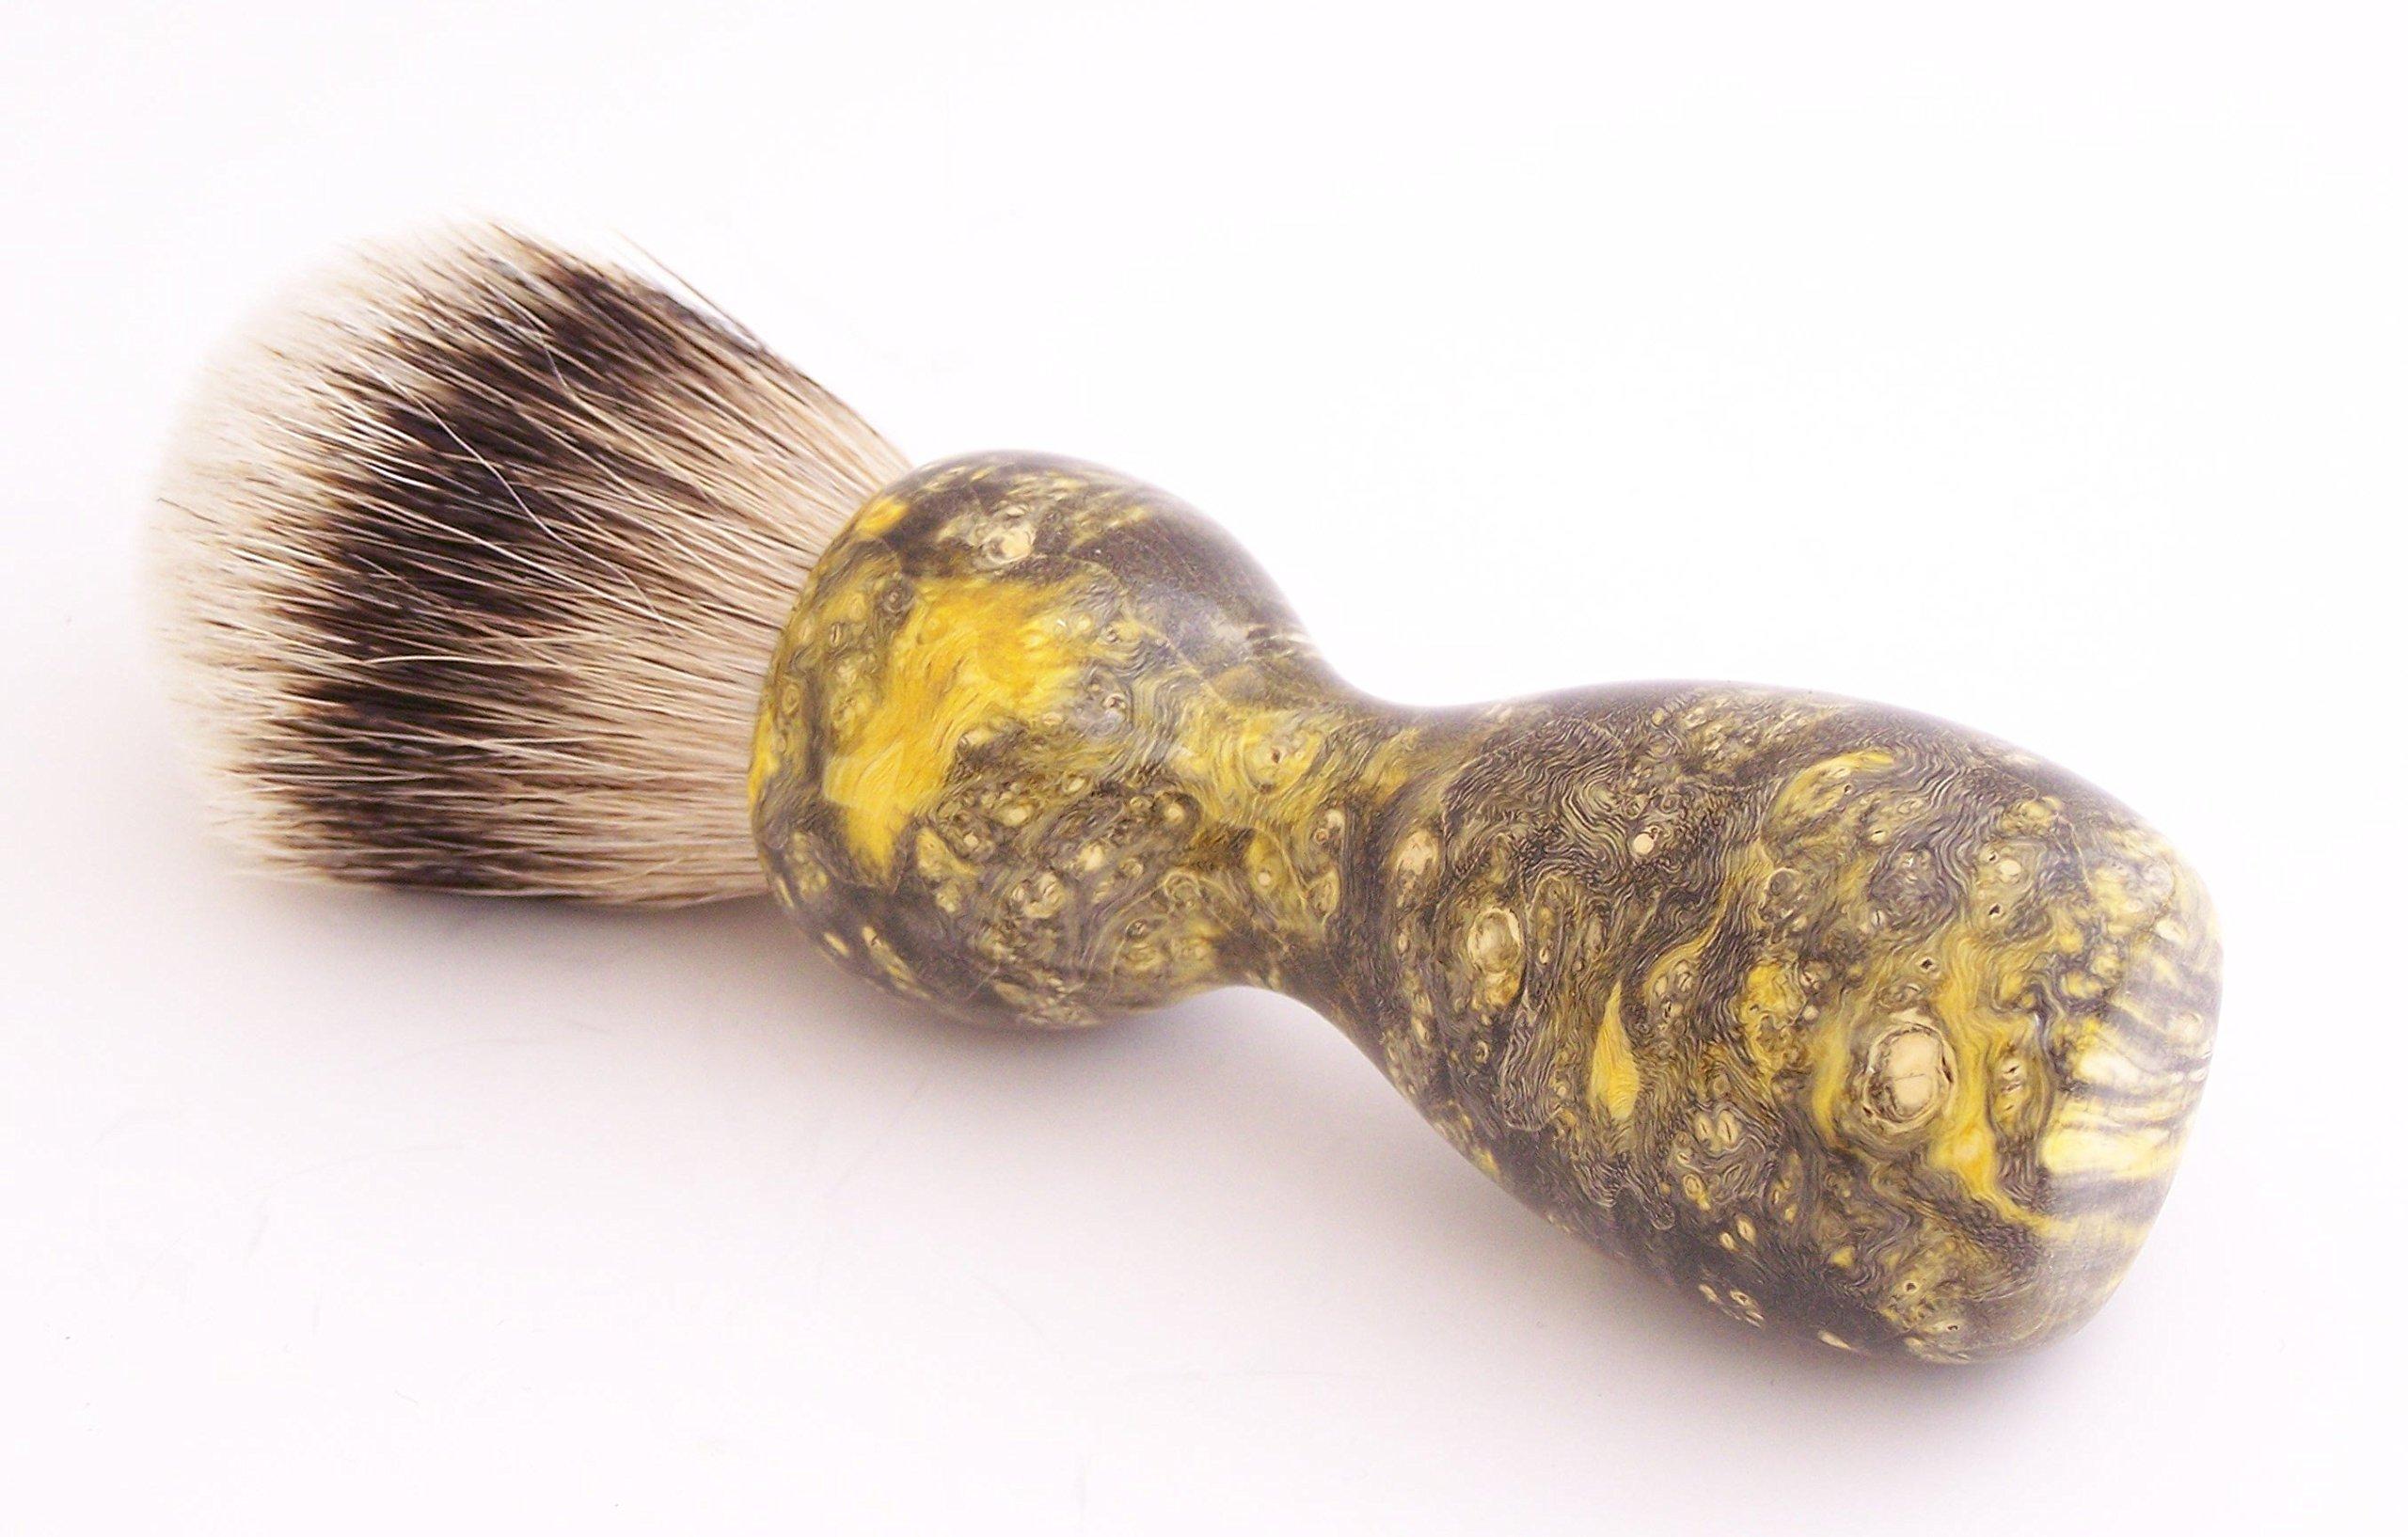 Black and Yellow Box Elder Burl Wood 22mm Super Silvertip Shaving Brush (BEB31)